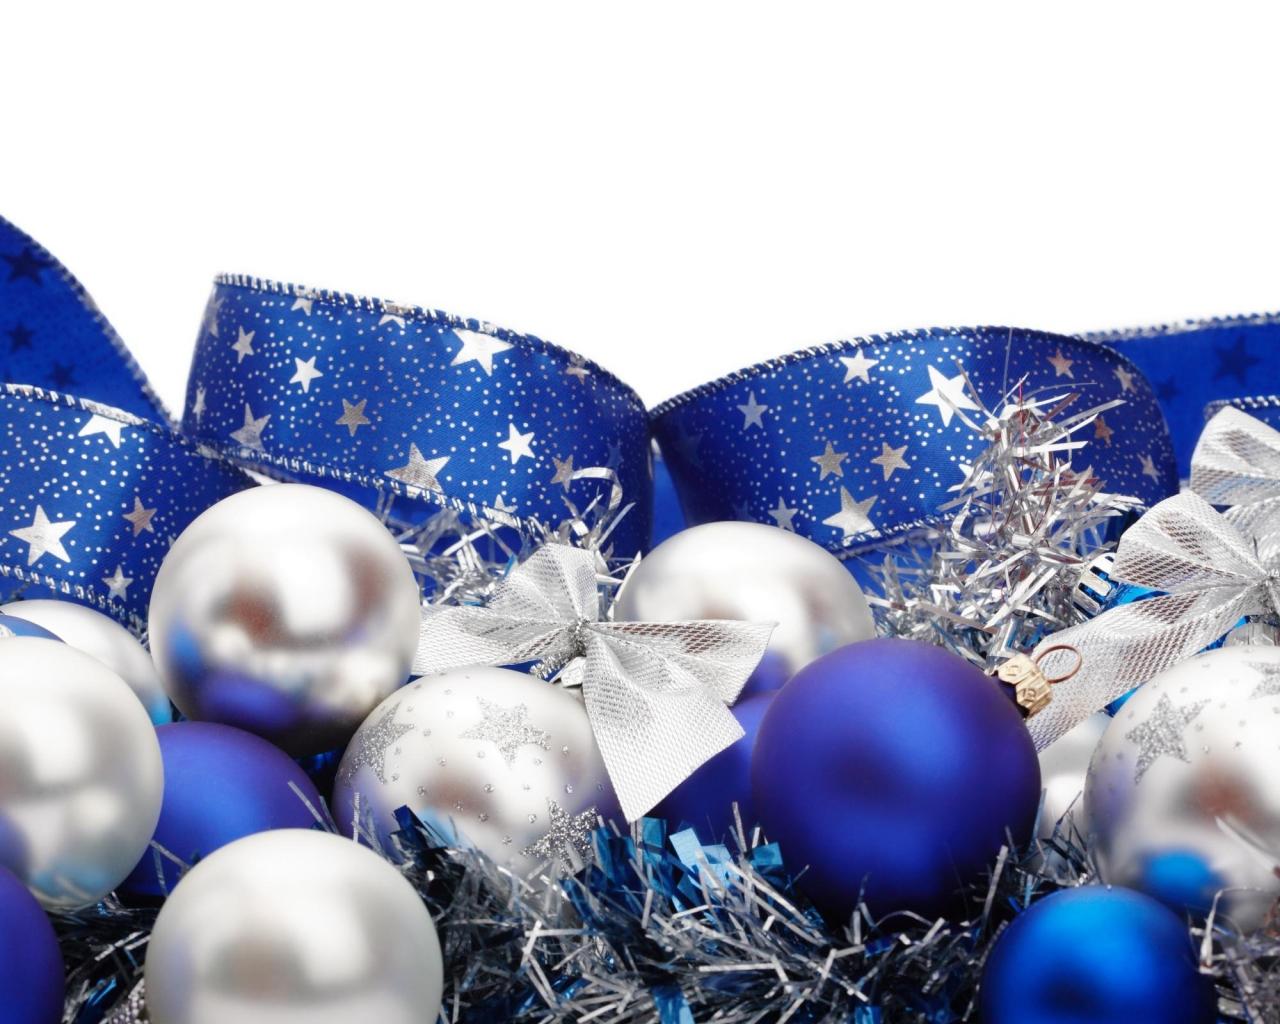 Adornos azules para navidad - 1280x1024